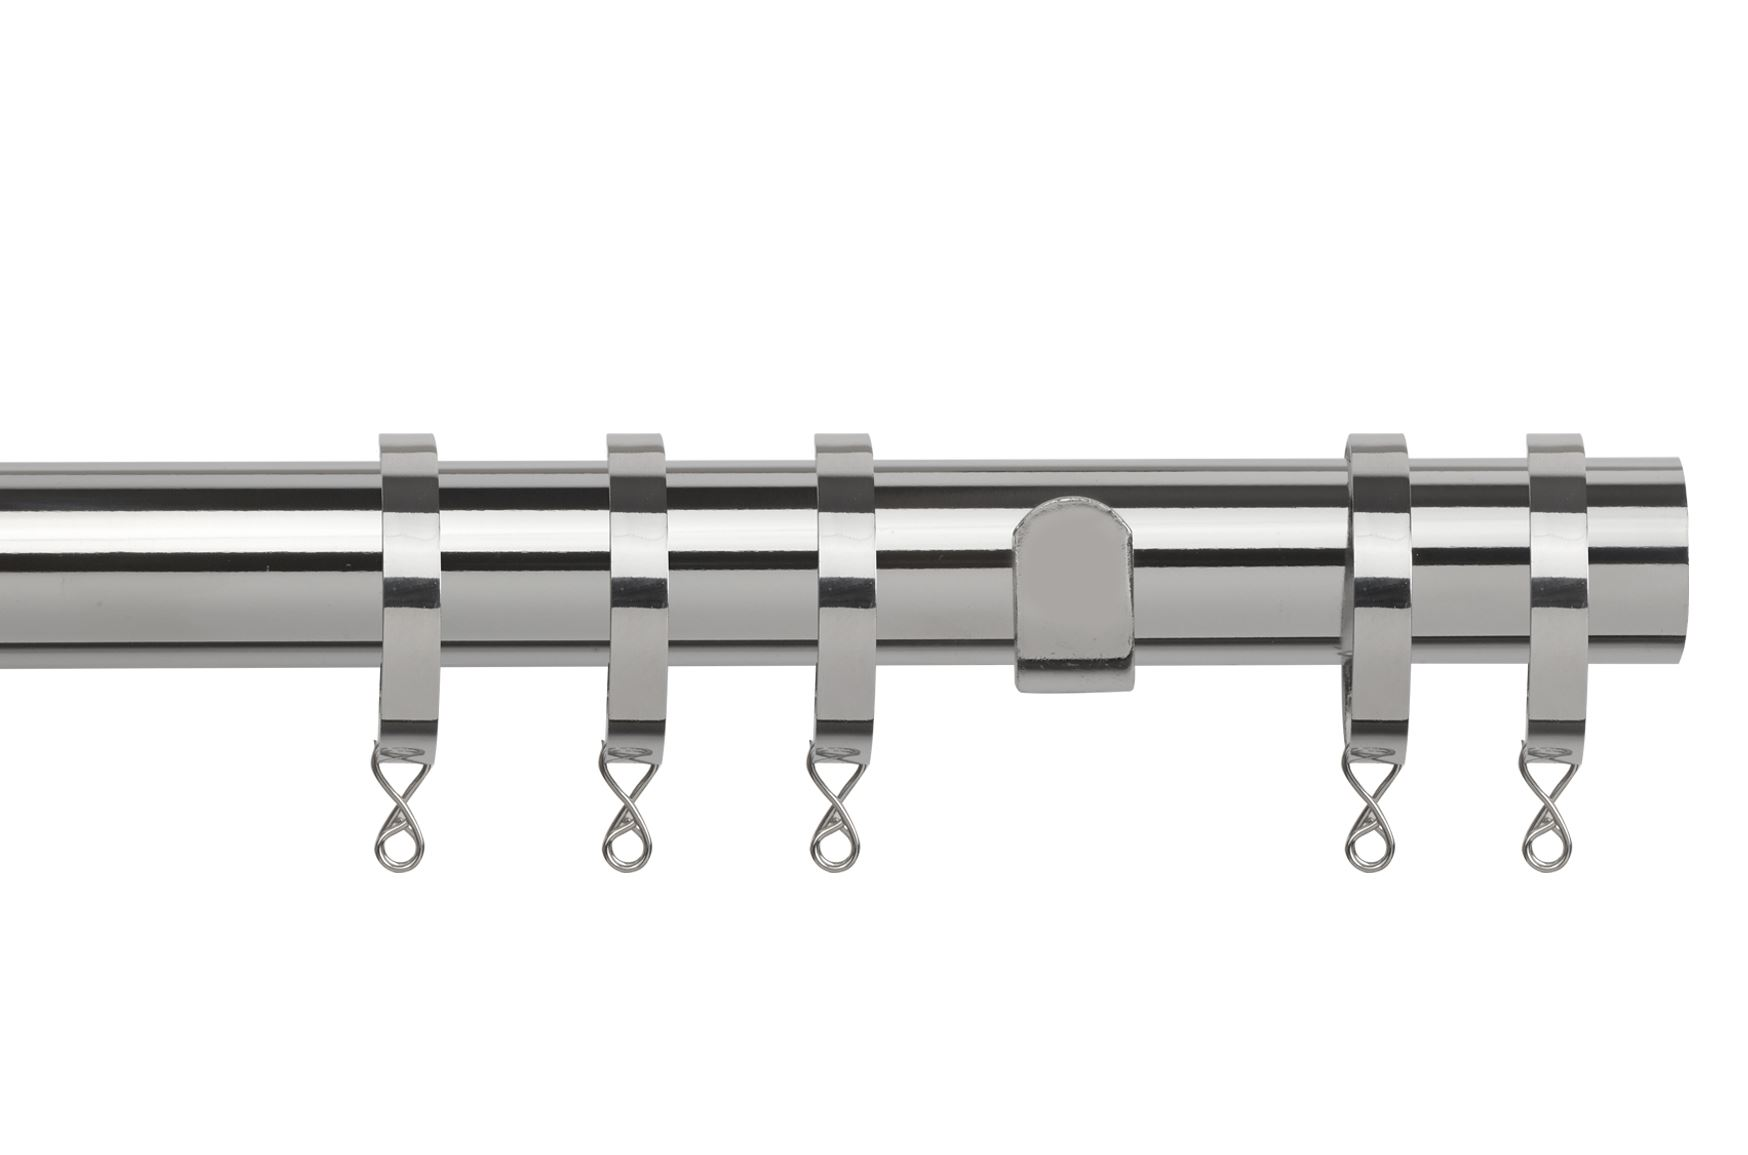 Curtain Rail Apart Fixed Pole Window Rod Adjustable Fittings Fittings Fittings 28mm Home Decor 1c2f9c